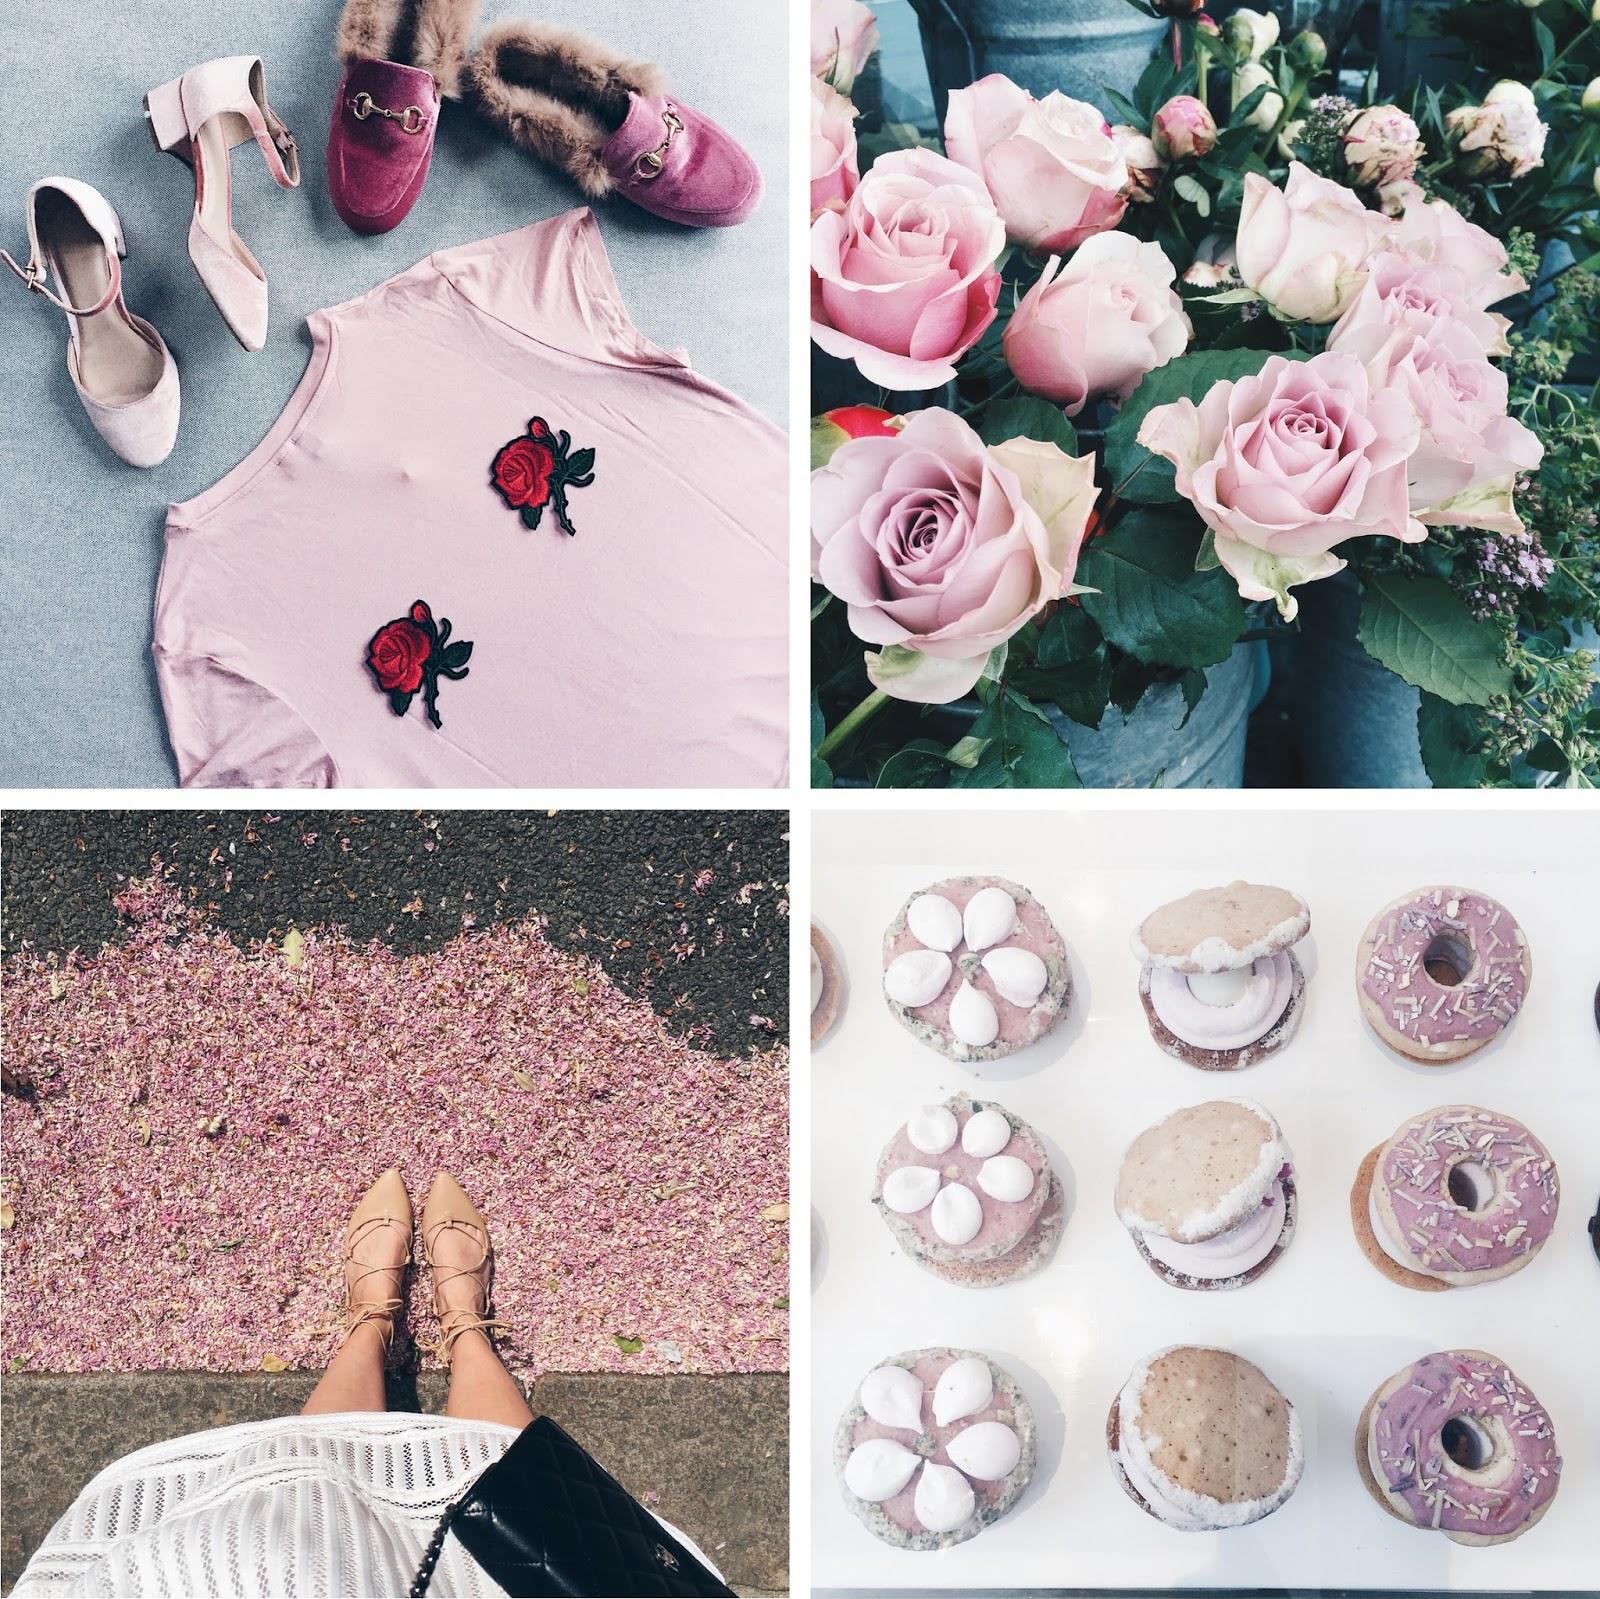 blush toned things